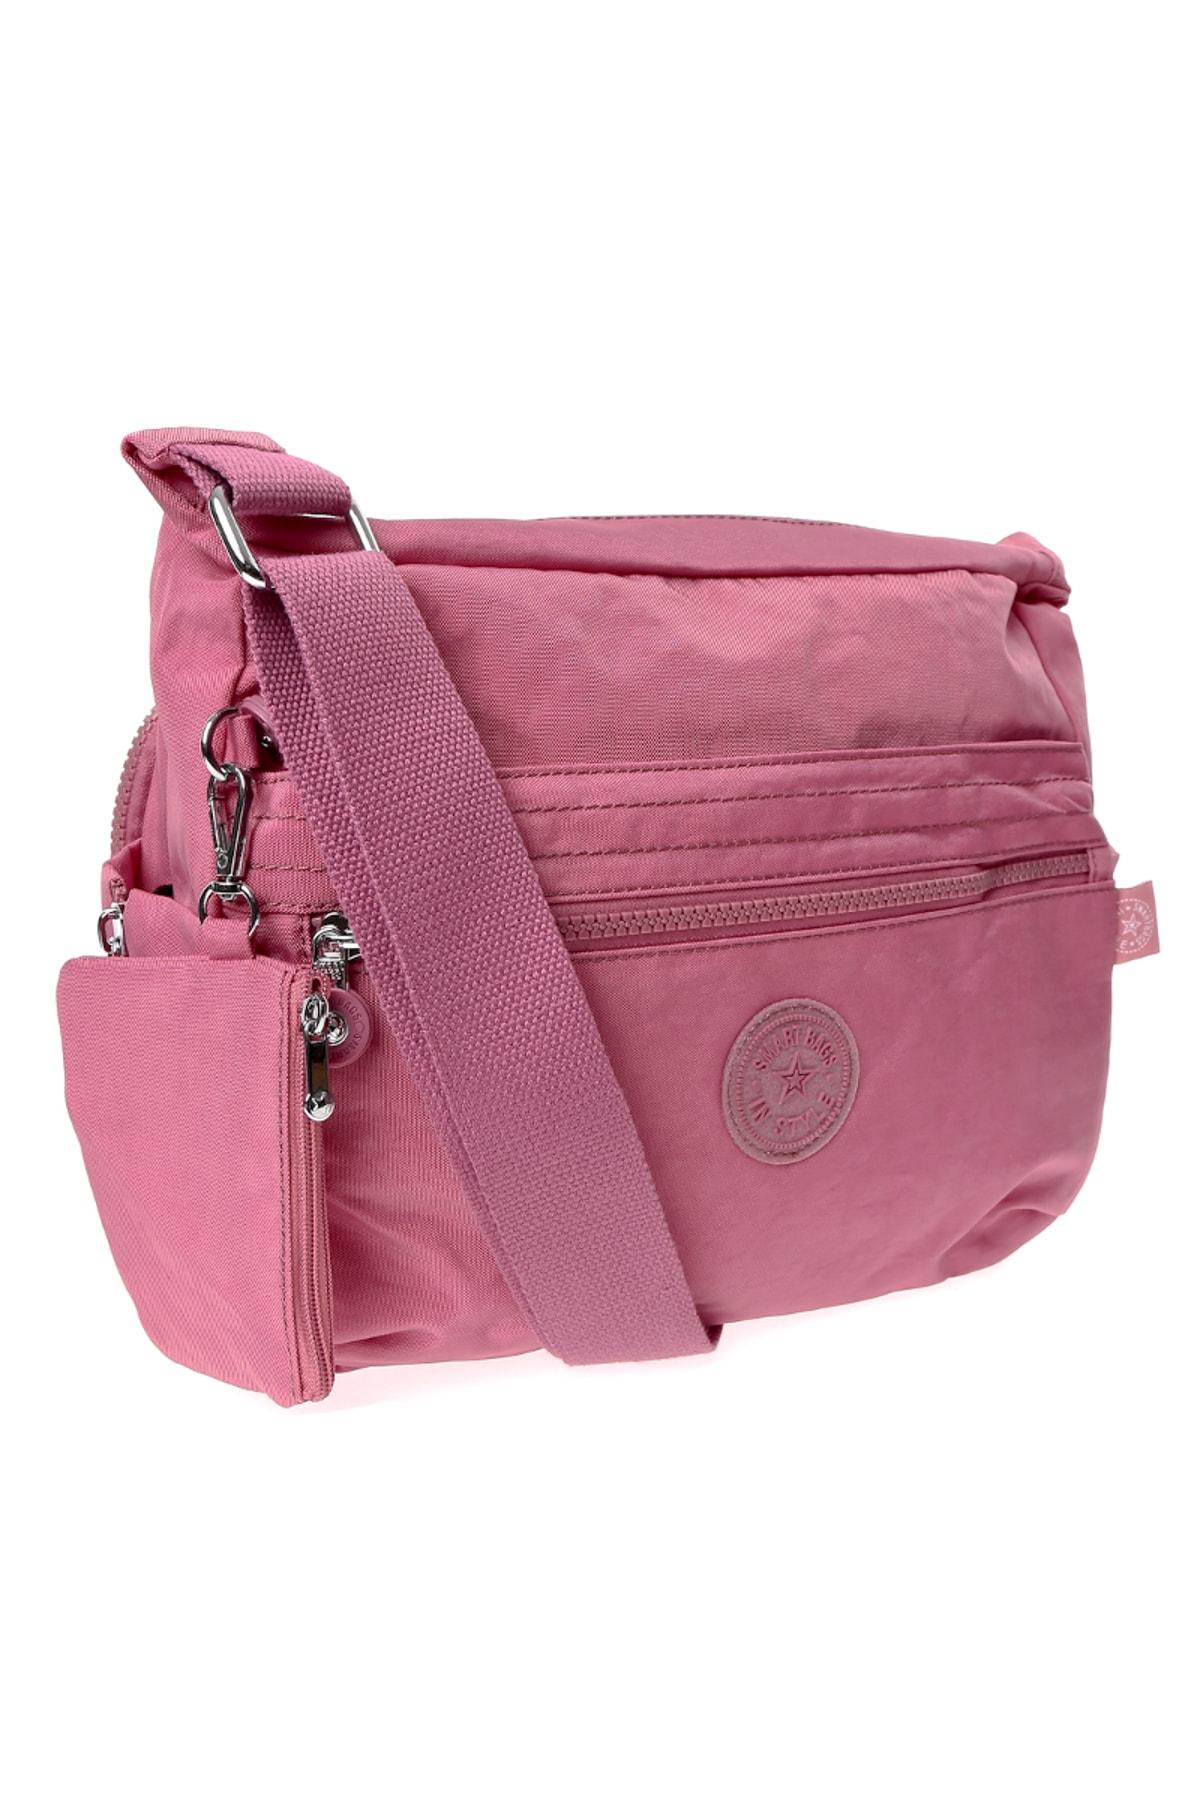 SMART BAGS Pembe Kadın Çanta 2